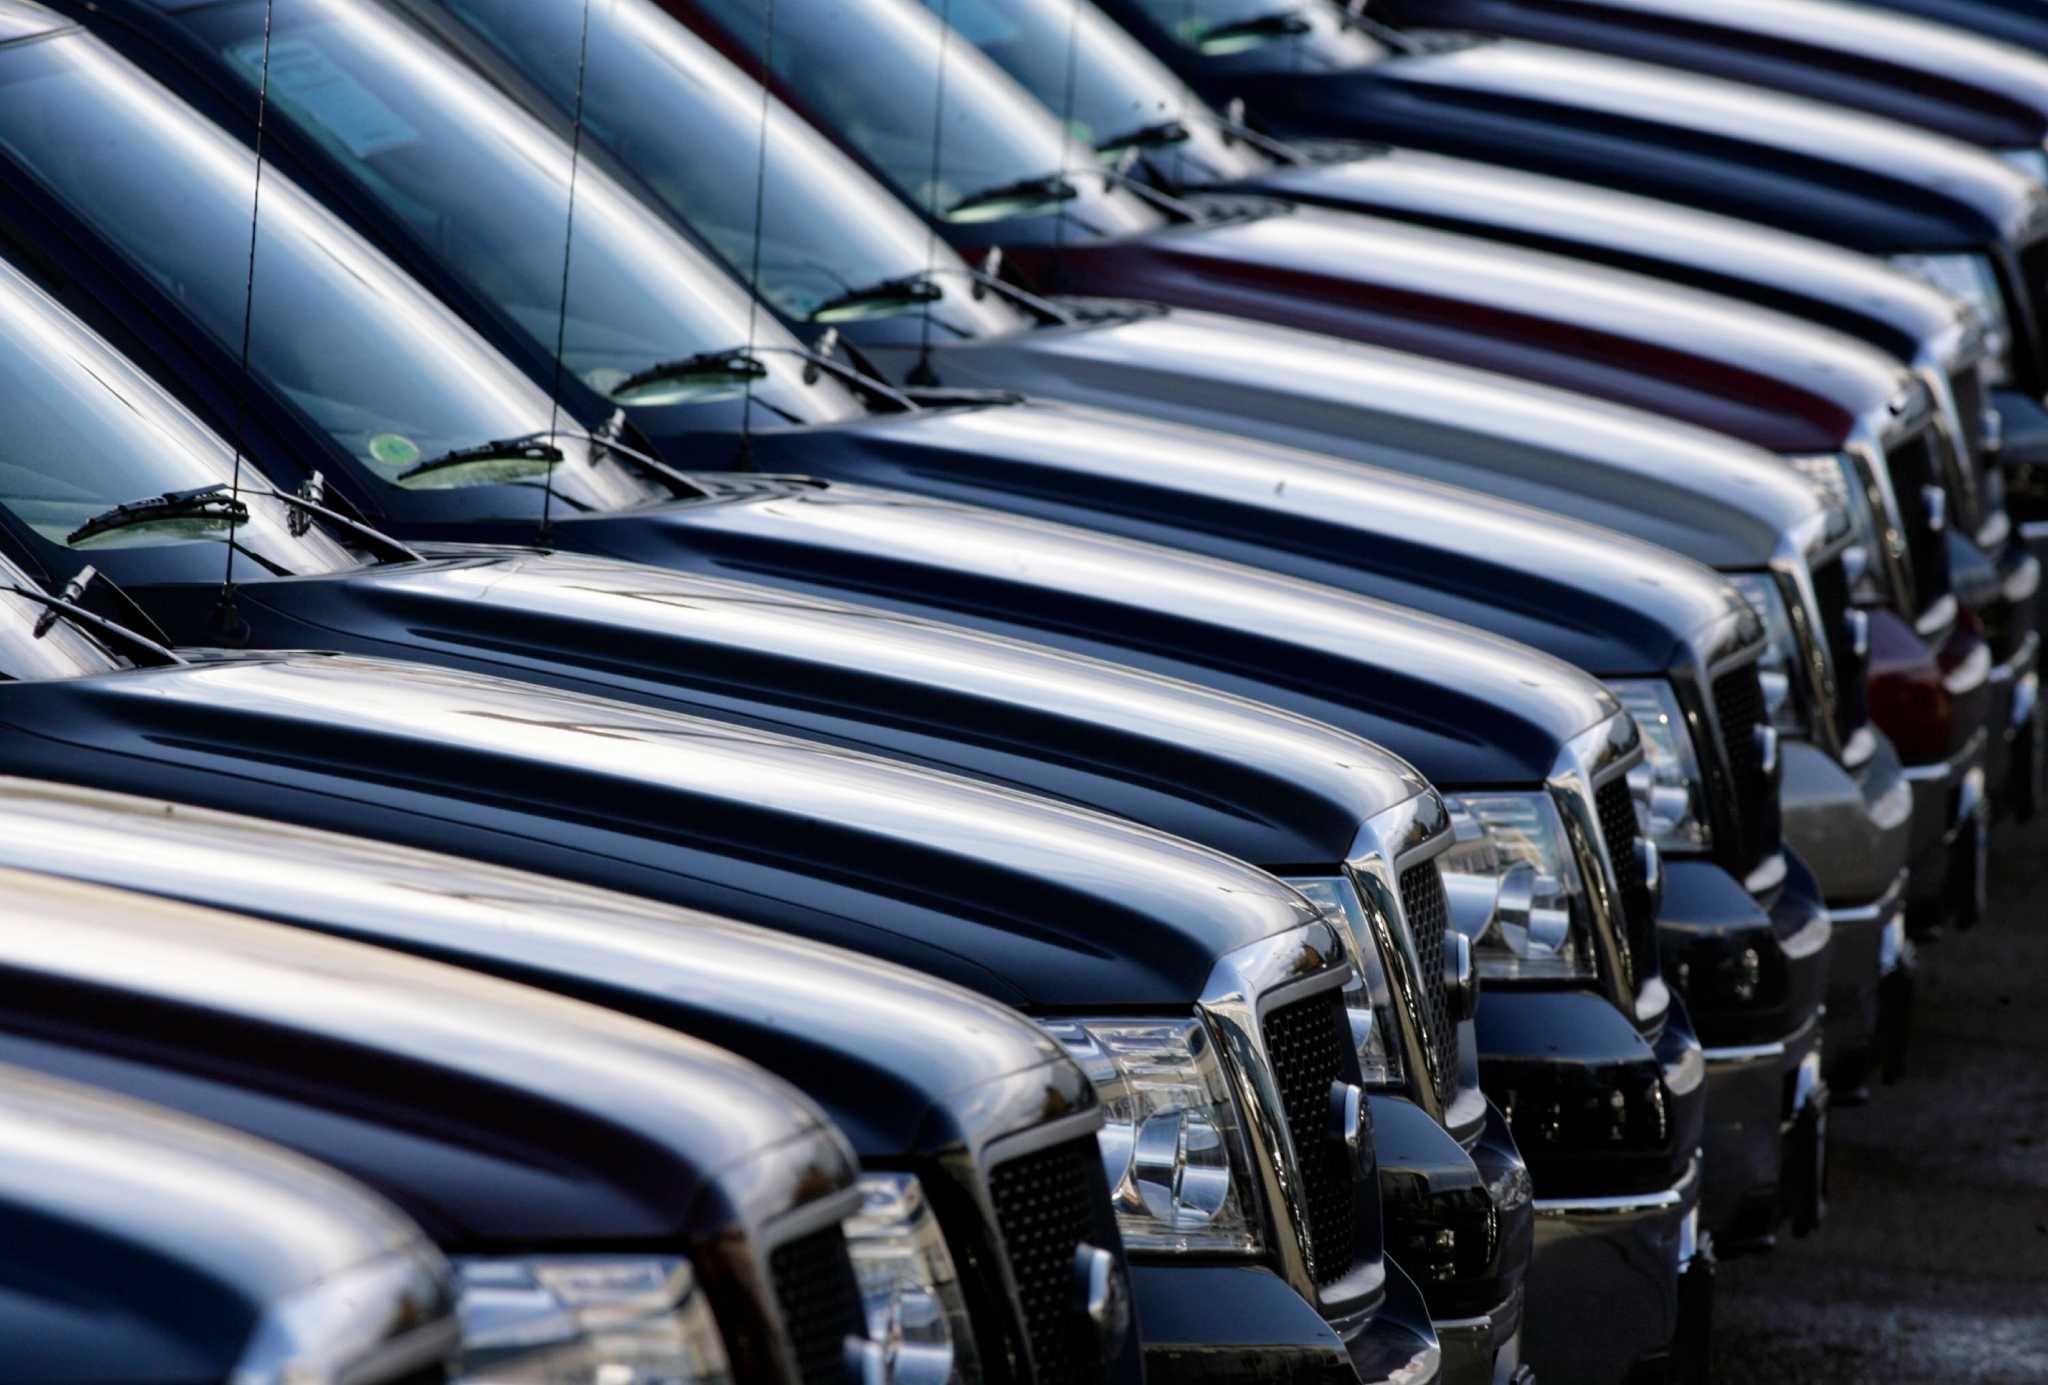 Axlegeeks compiles best pickup trucks under 35 000 seattlepi com